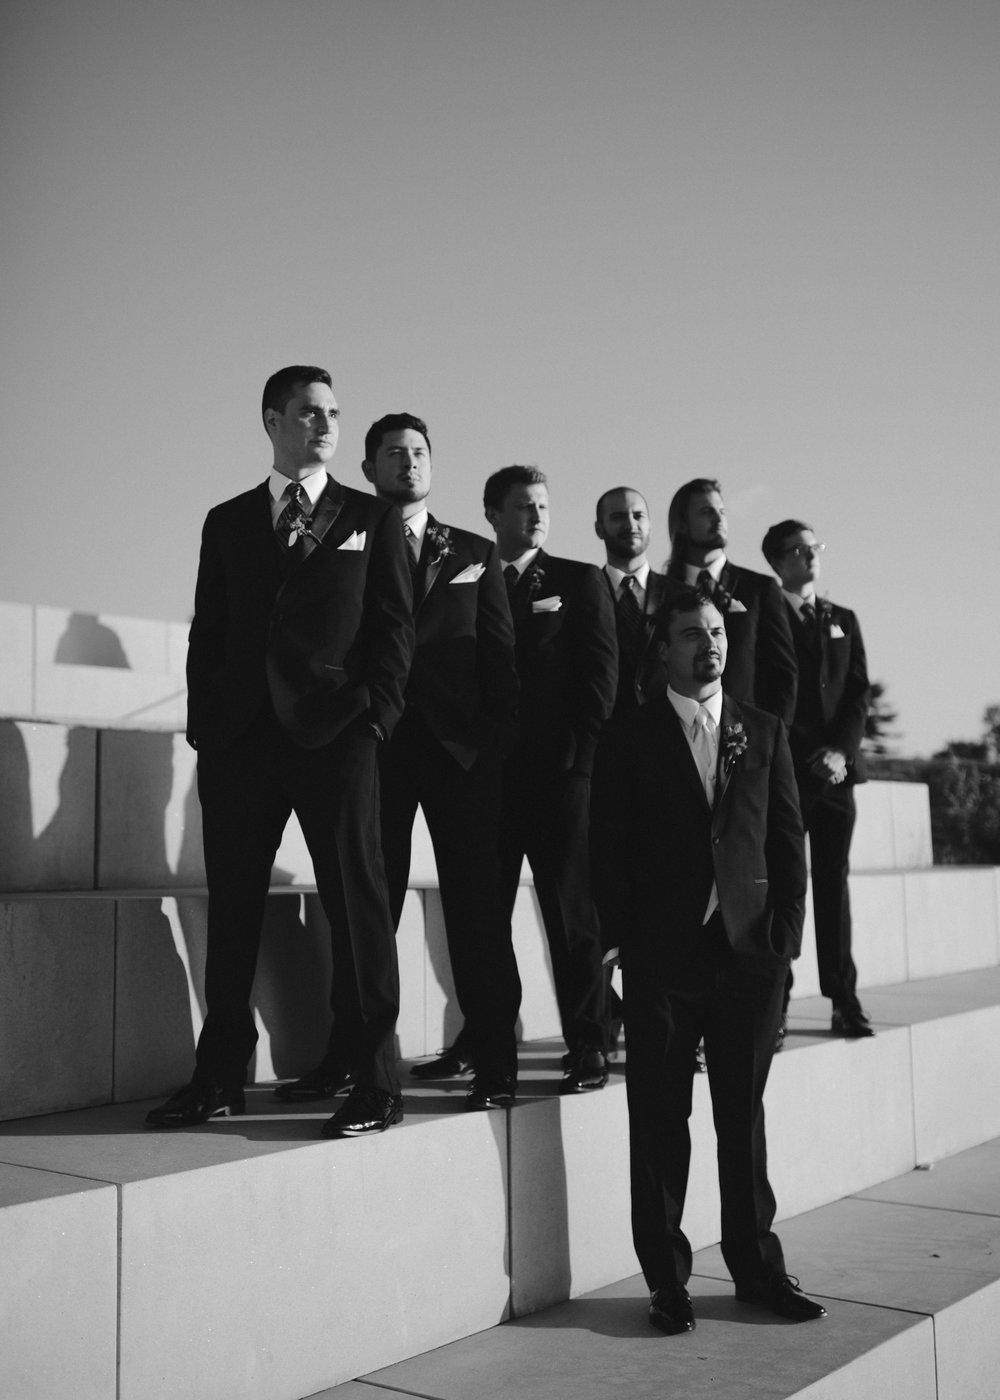 jordan-stayer-wedding-172.jpg